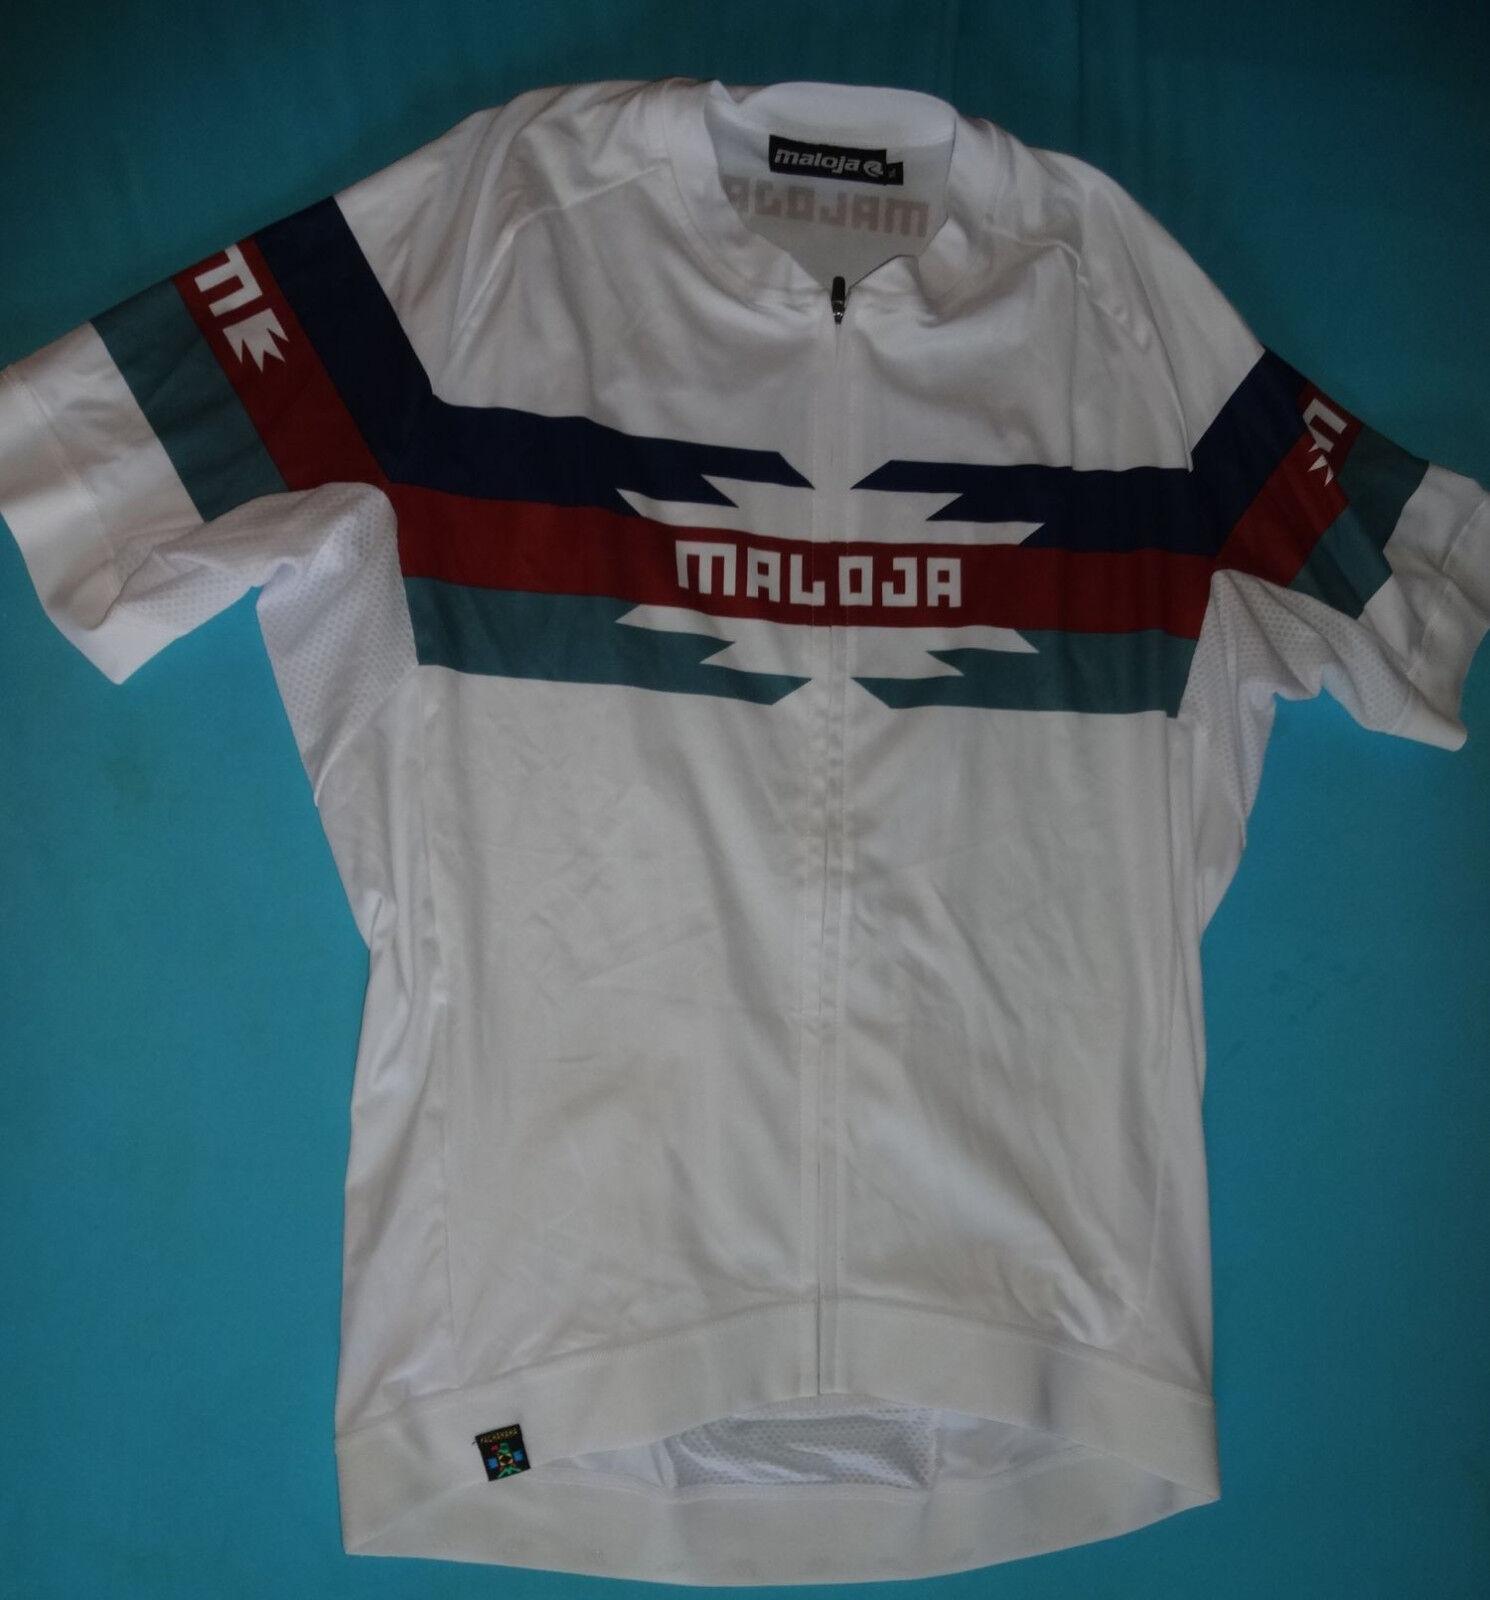 Maloja Rennrad Fahrrad MTB MTB MTB Trikot T-Shirt Gr. XL bc488e